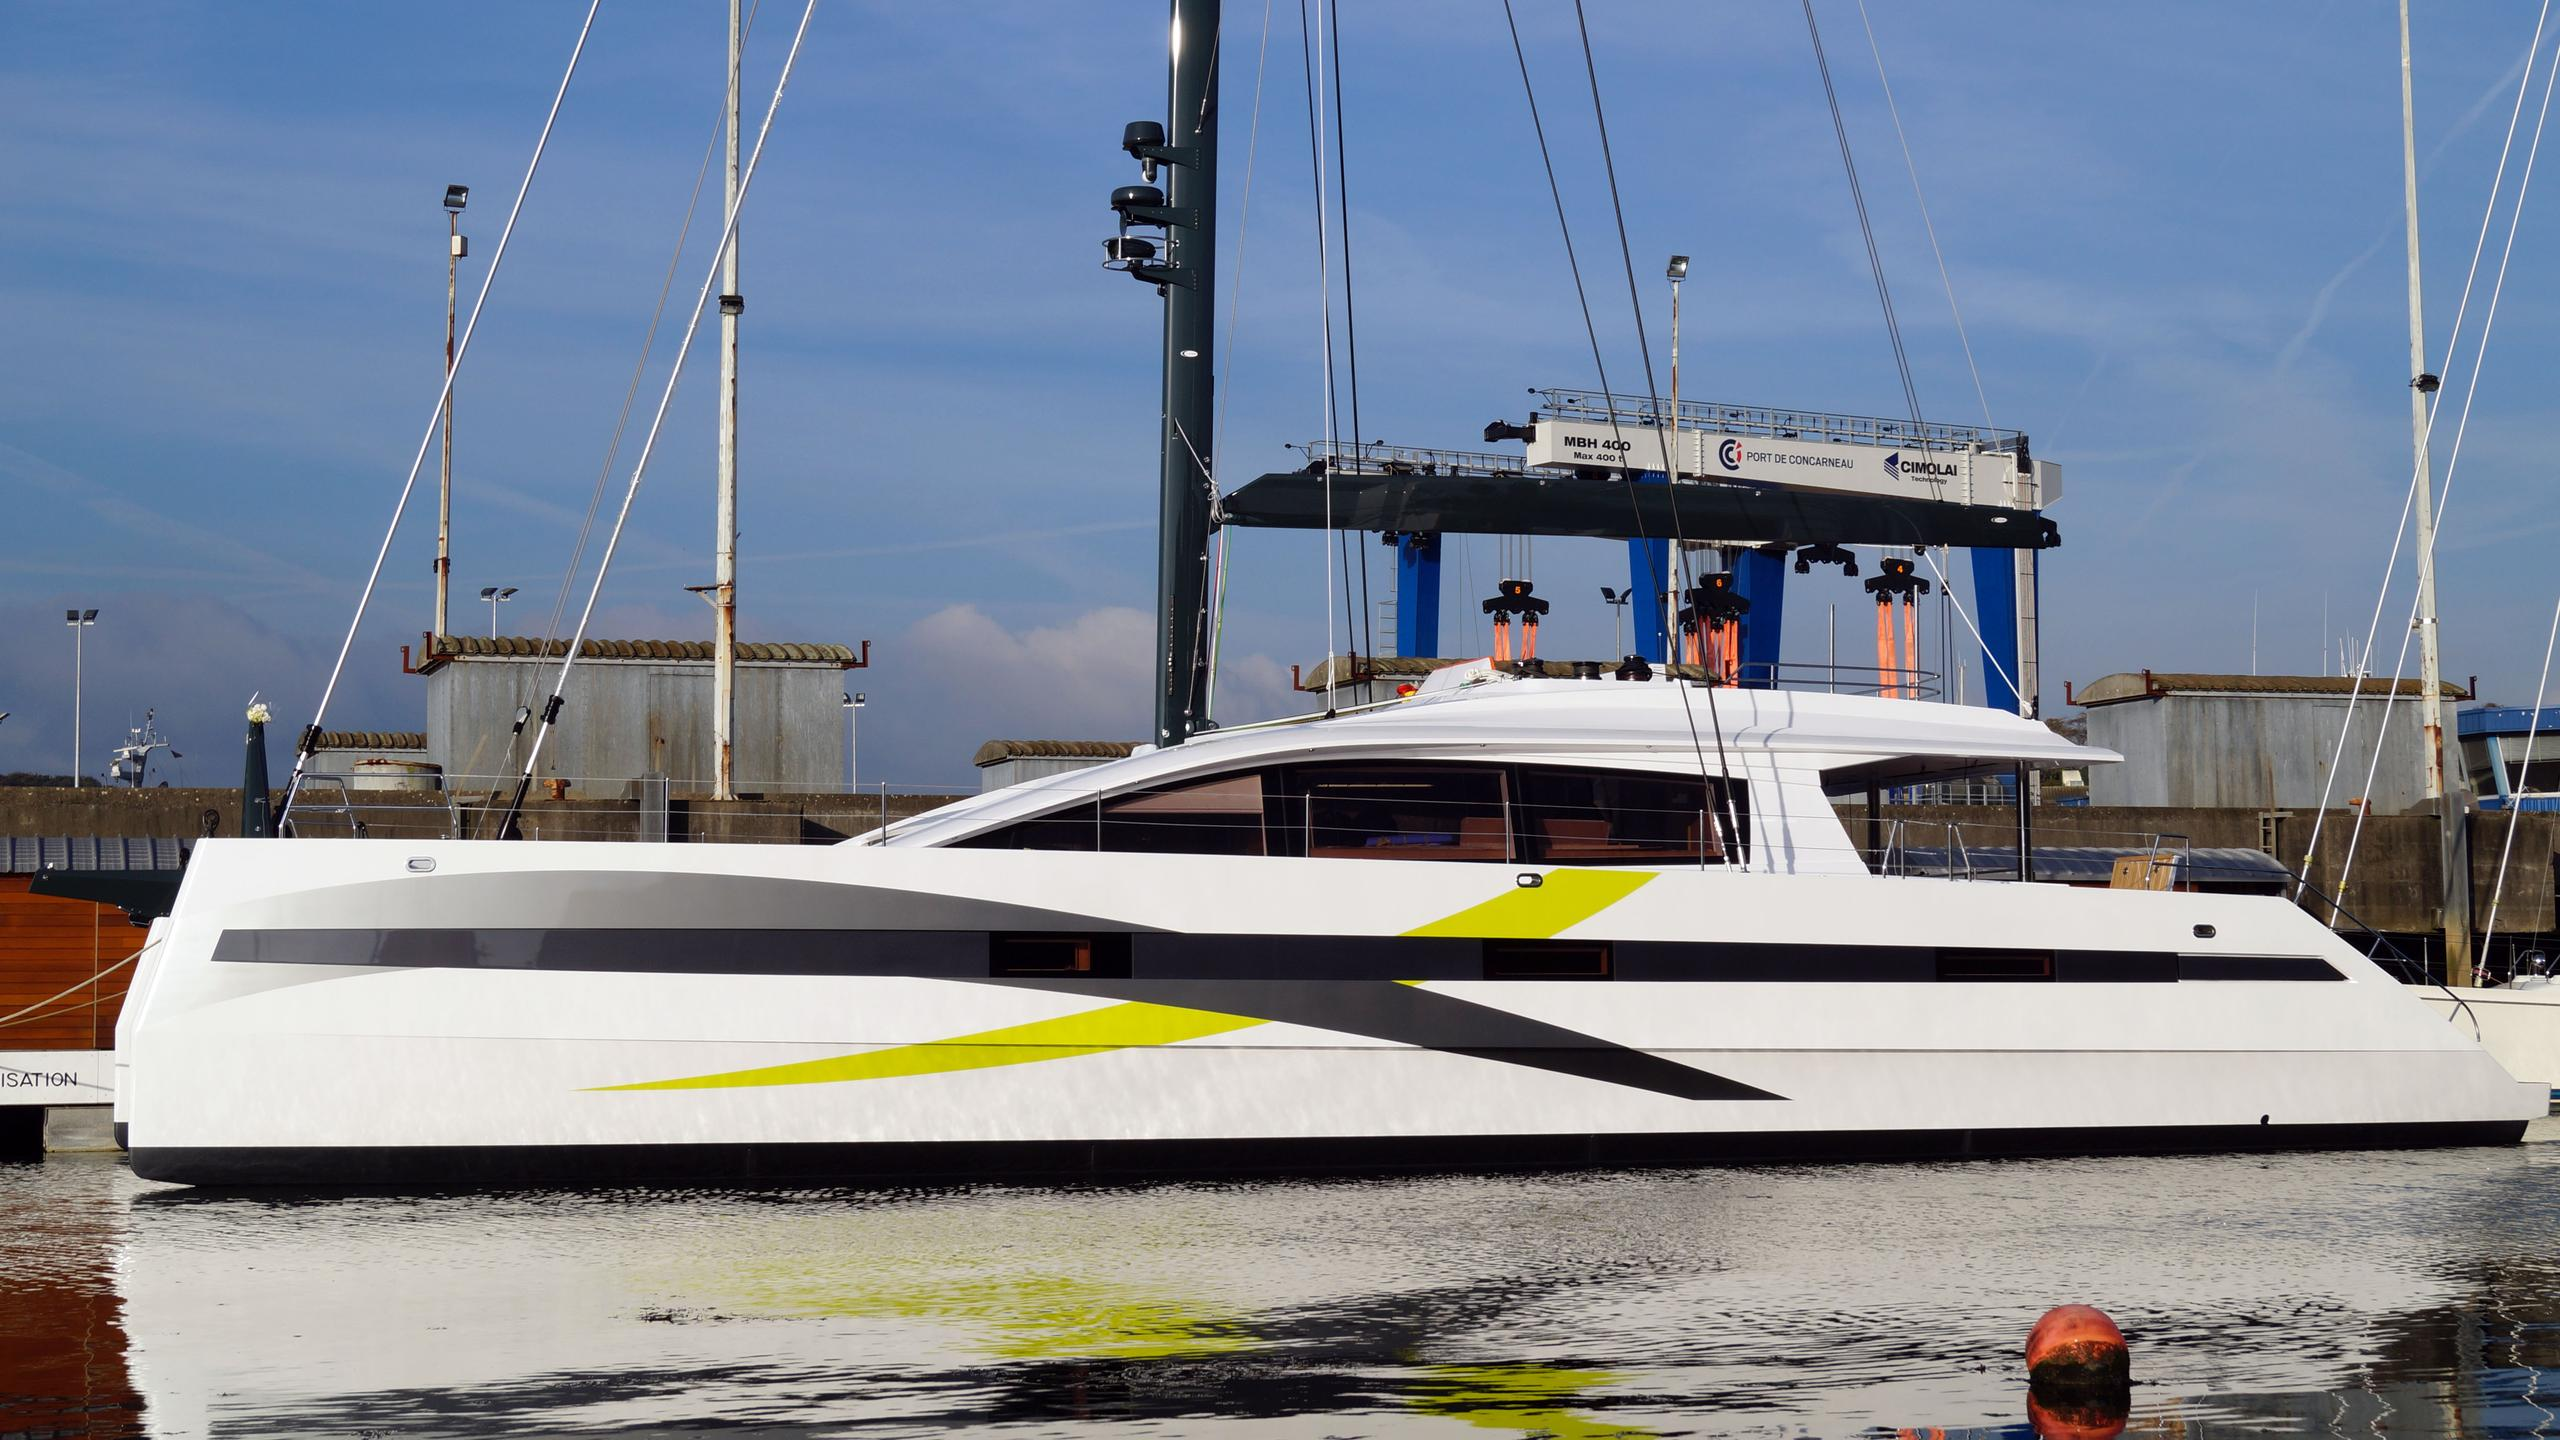 long island 85 hull 2 catamaran sailing yacht jfa yachts 26m 2017 launch profile